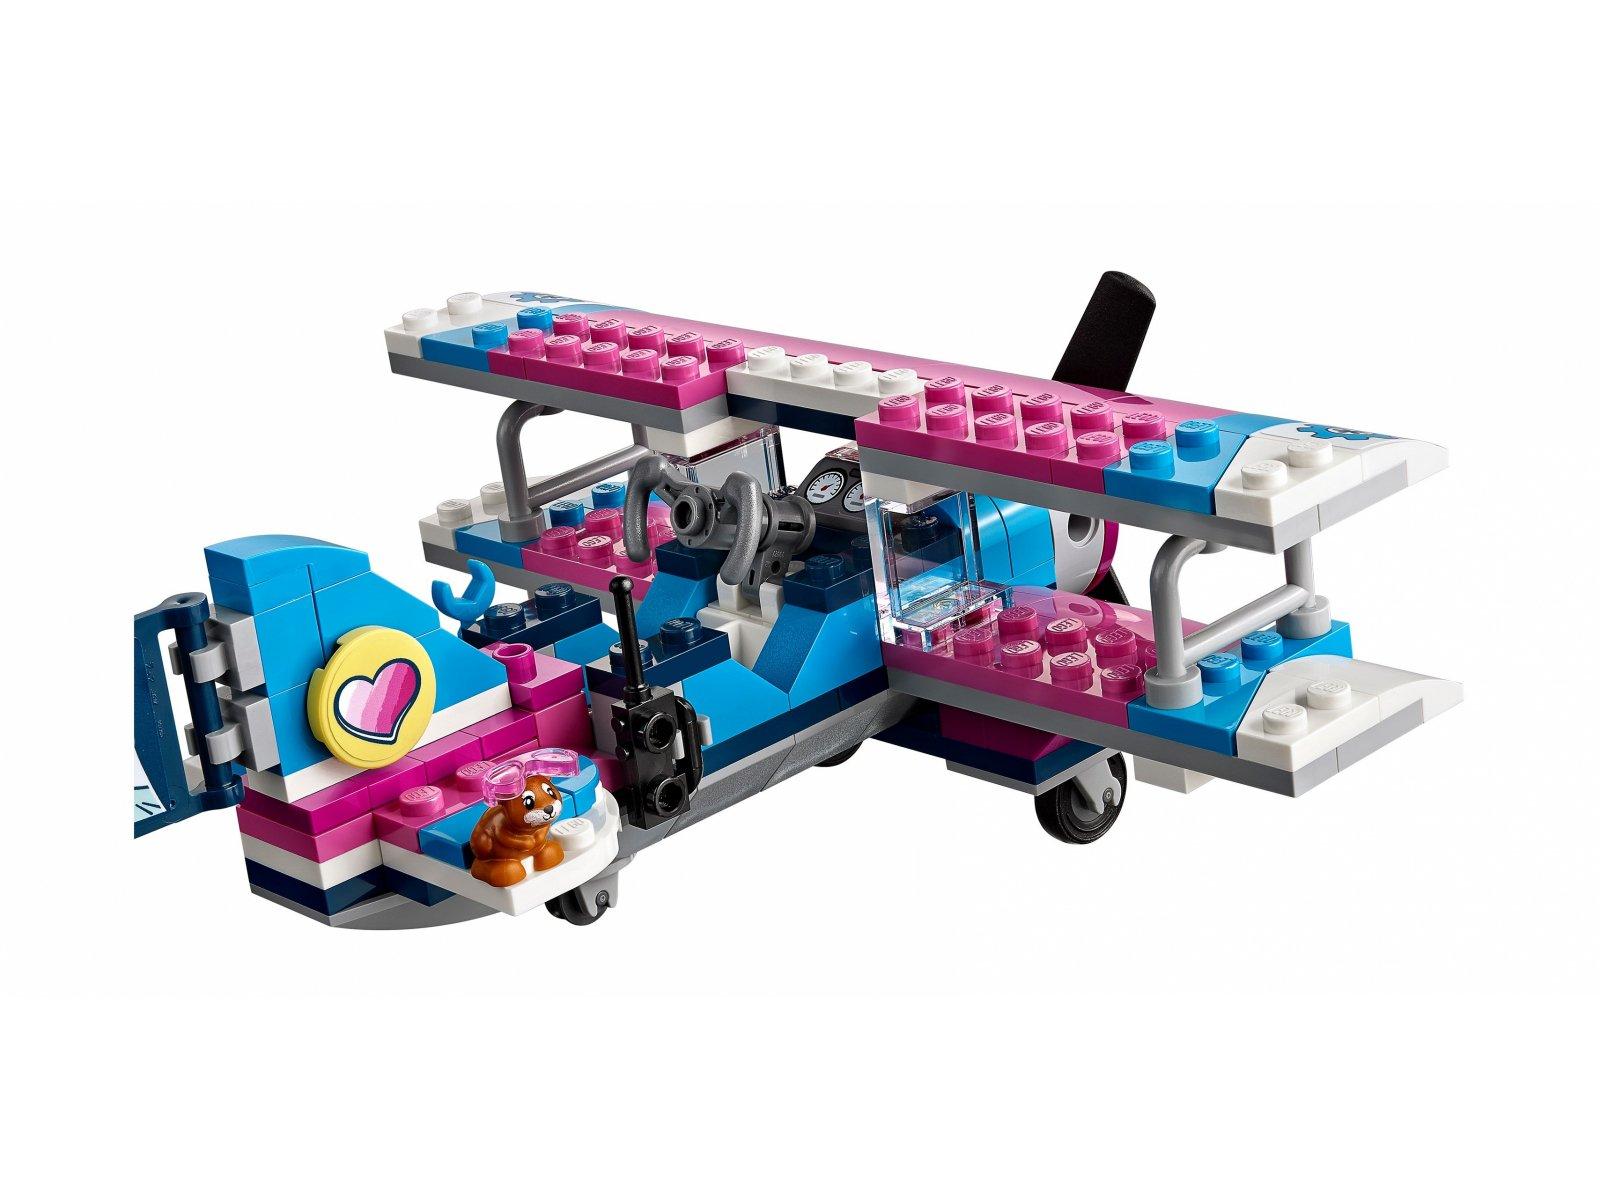 LEGO Friends Lot samolotem nad Miastem Heartlake